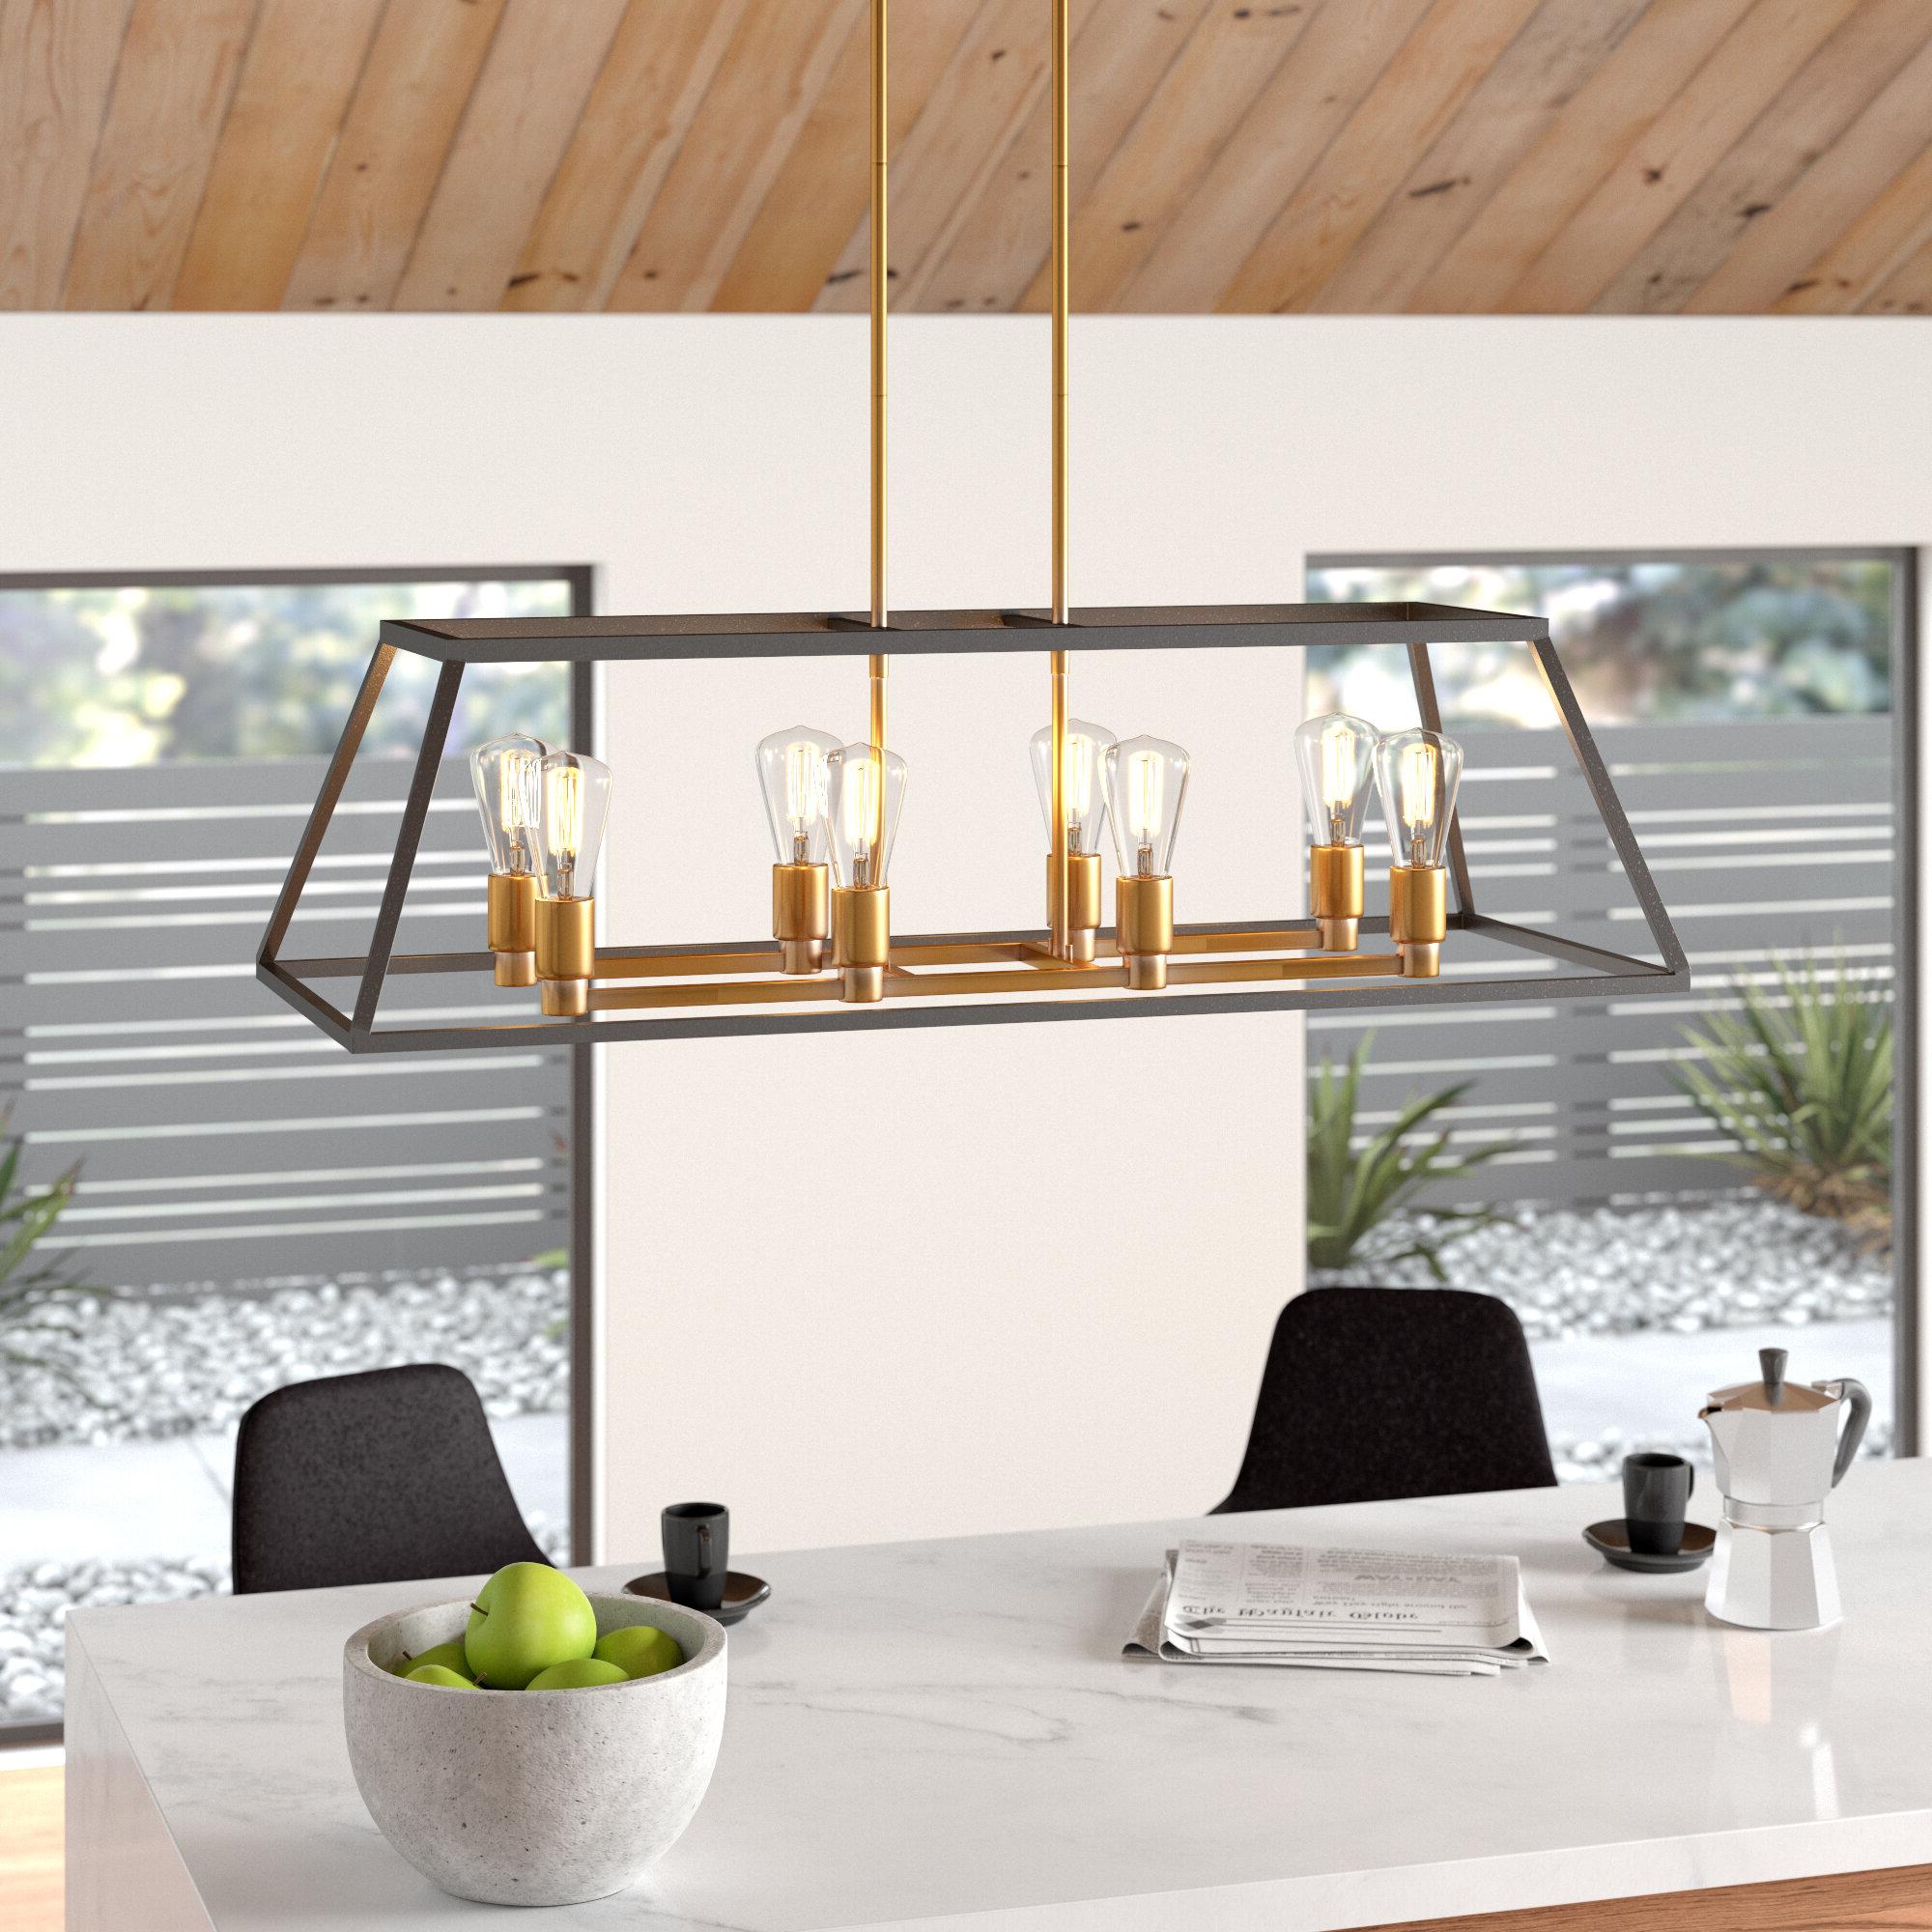 Sousa 4 Light Kitchen Island Linear Pendants Inside 2020 Shisler 8 Light Kitchen Island Linear Pendant (View 16 of 25)